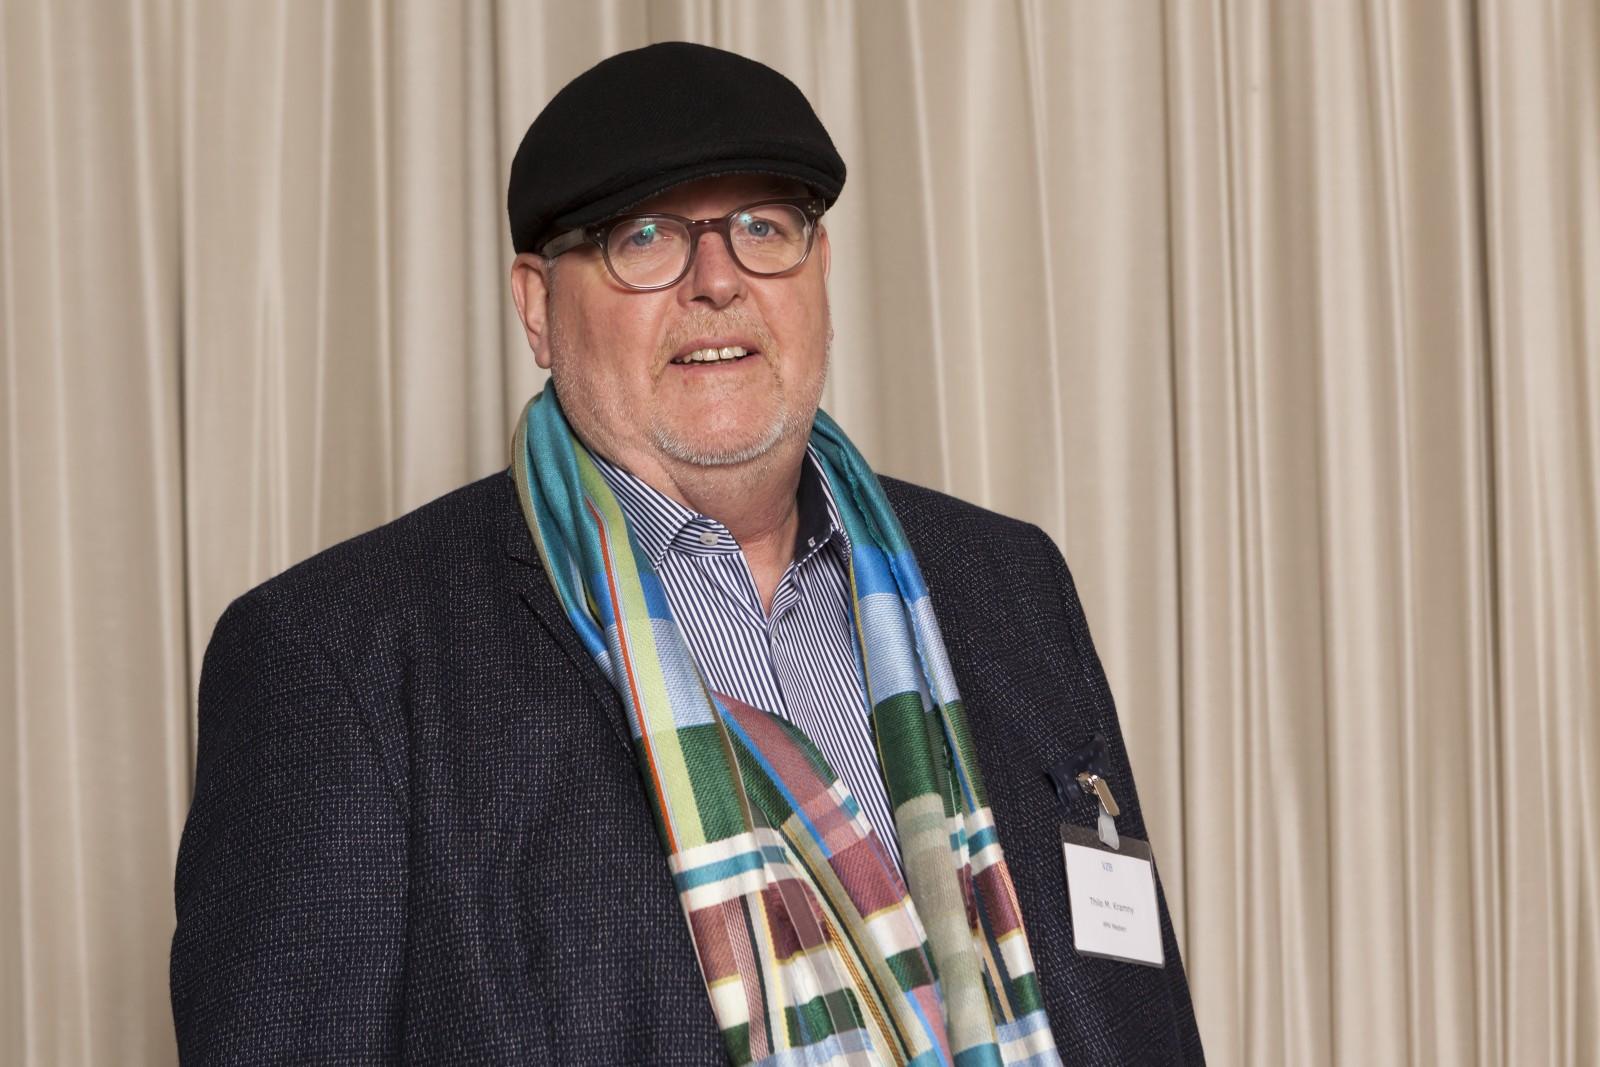 Thilo Kramny, PPV Medien